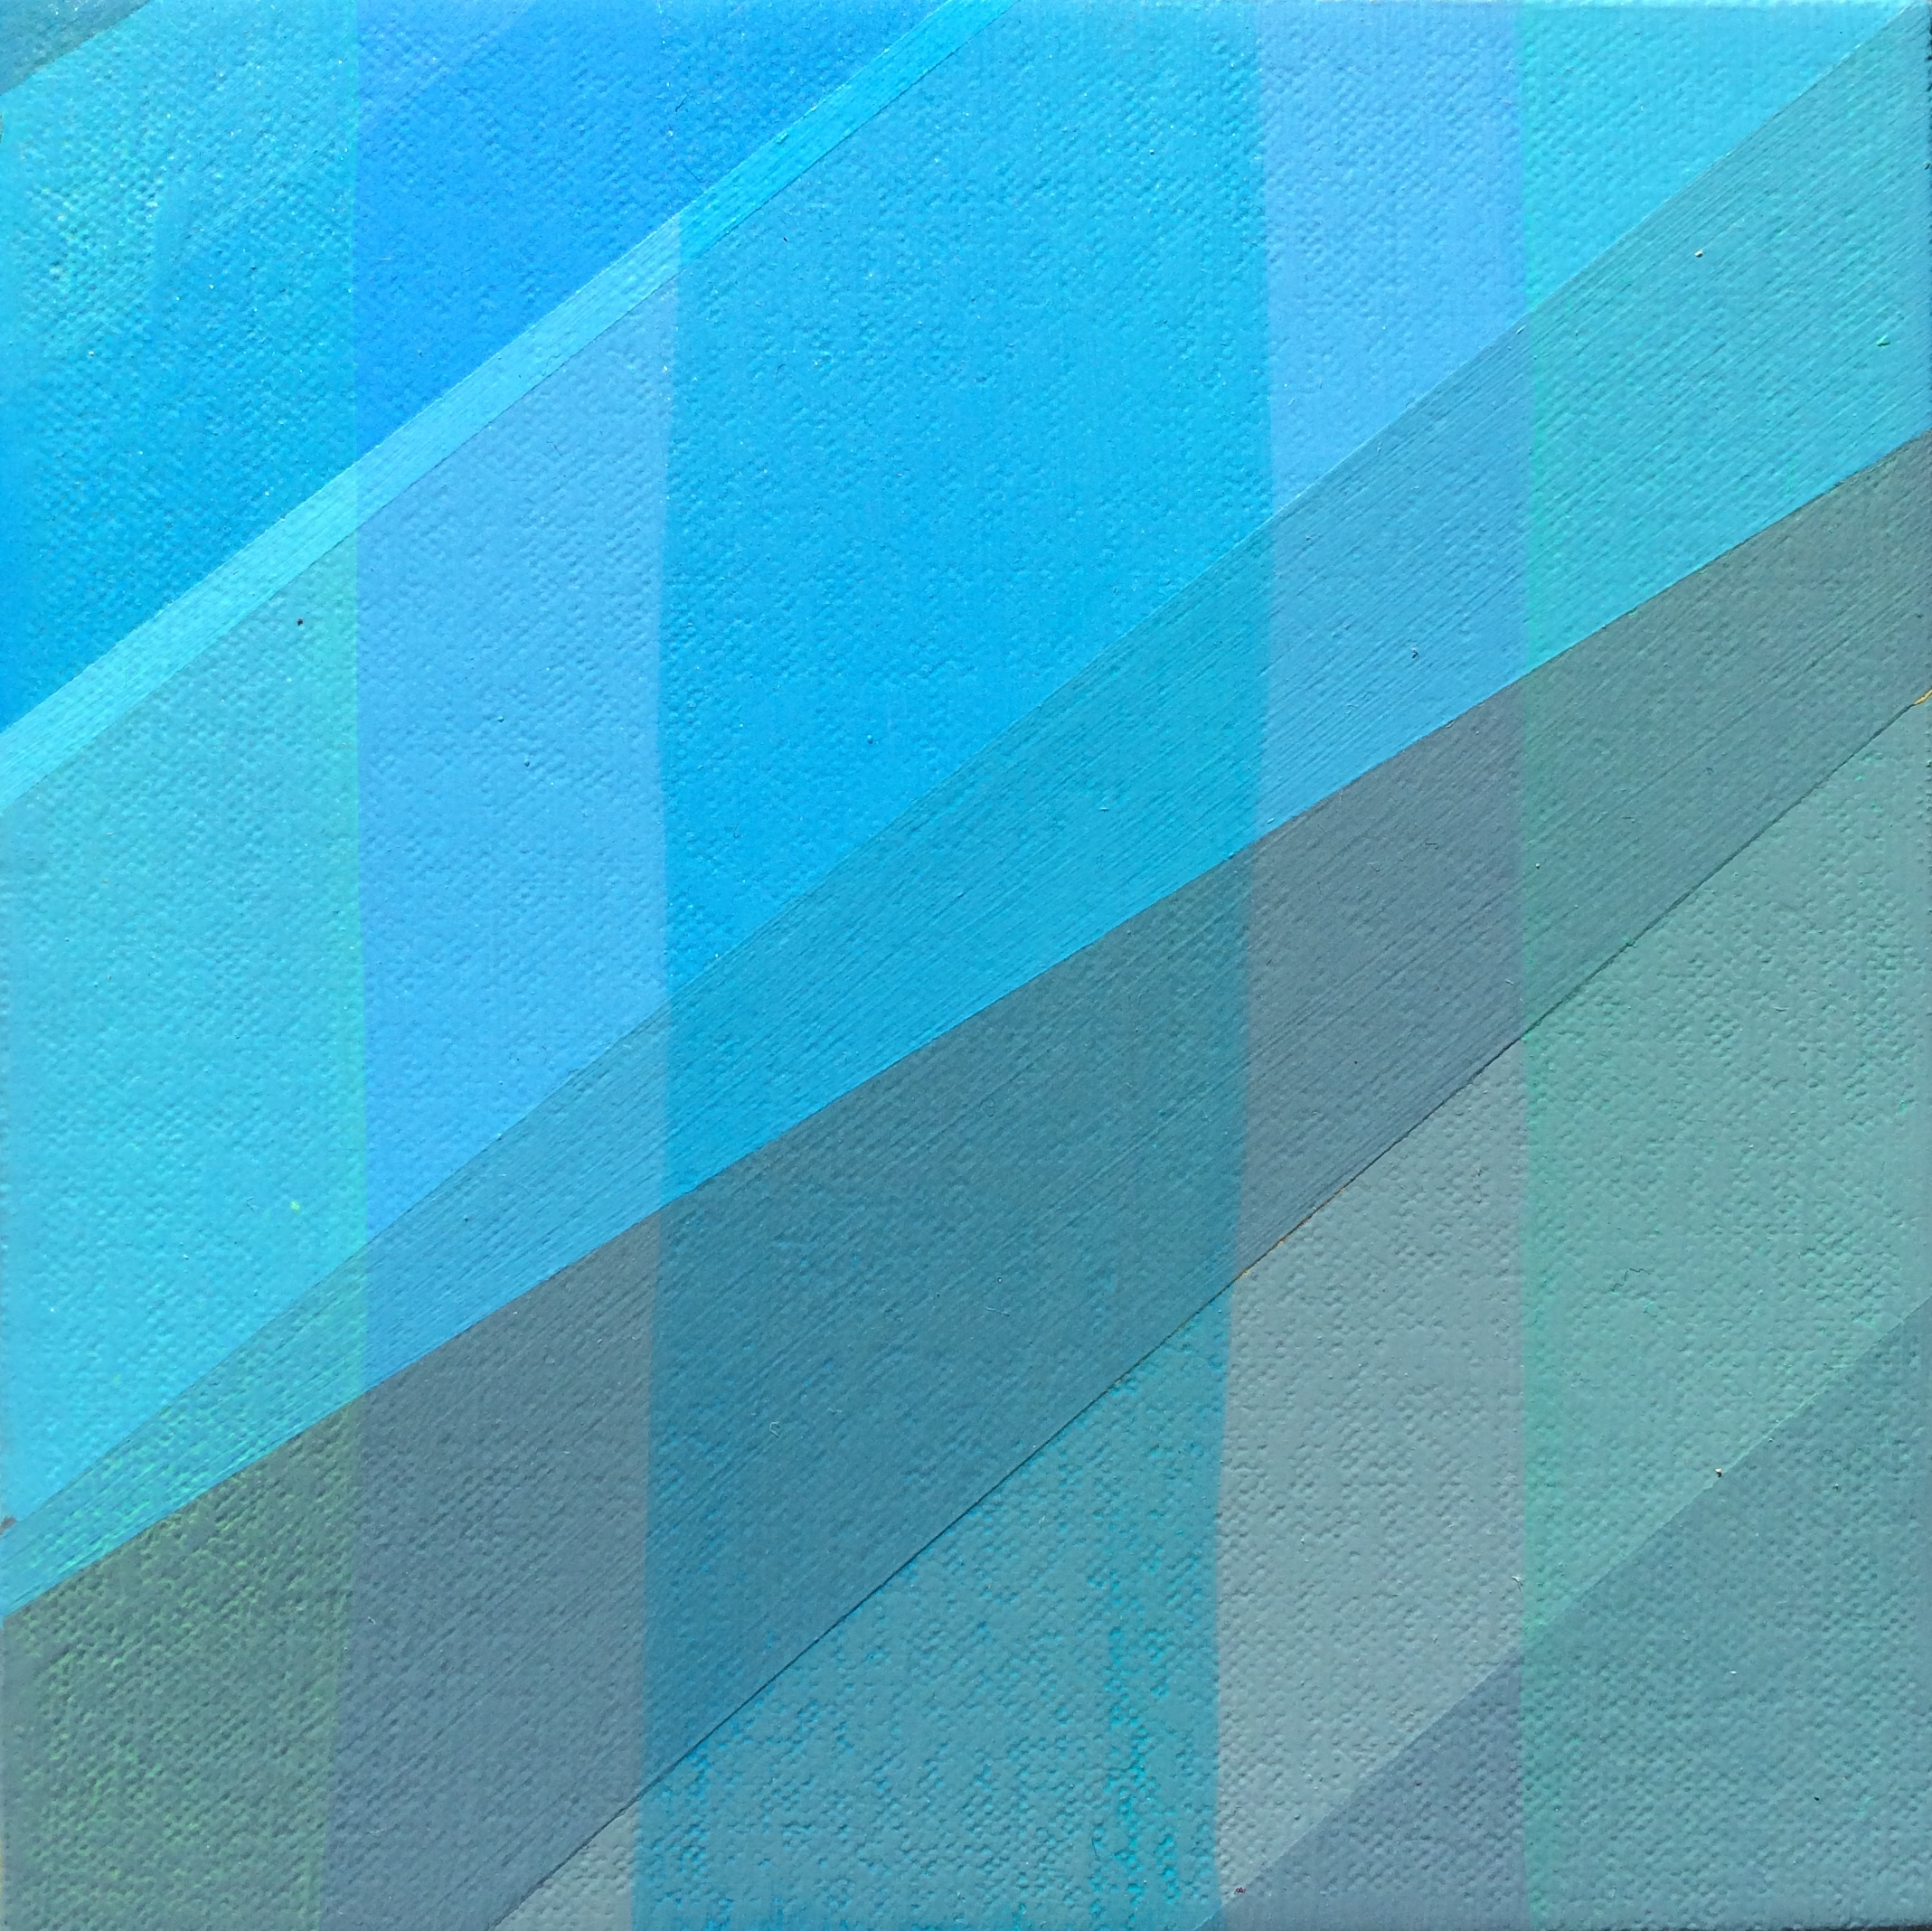 "Mountain Level, 2016, 6"" X 6"", Acrylic on canvas"